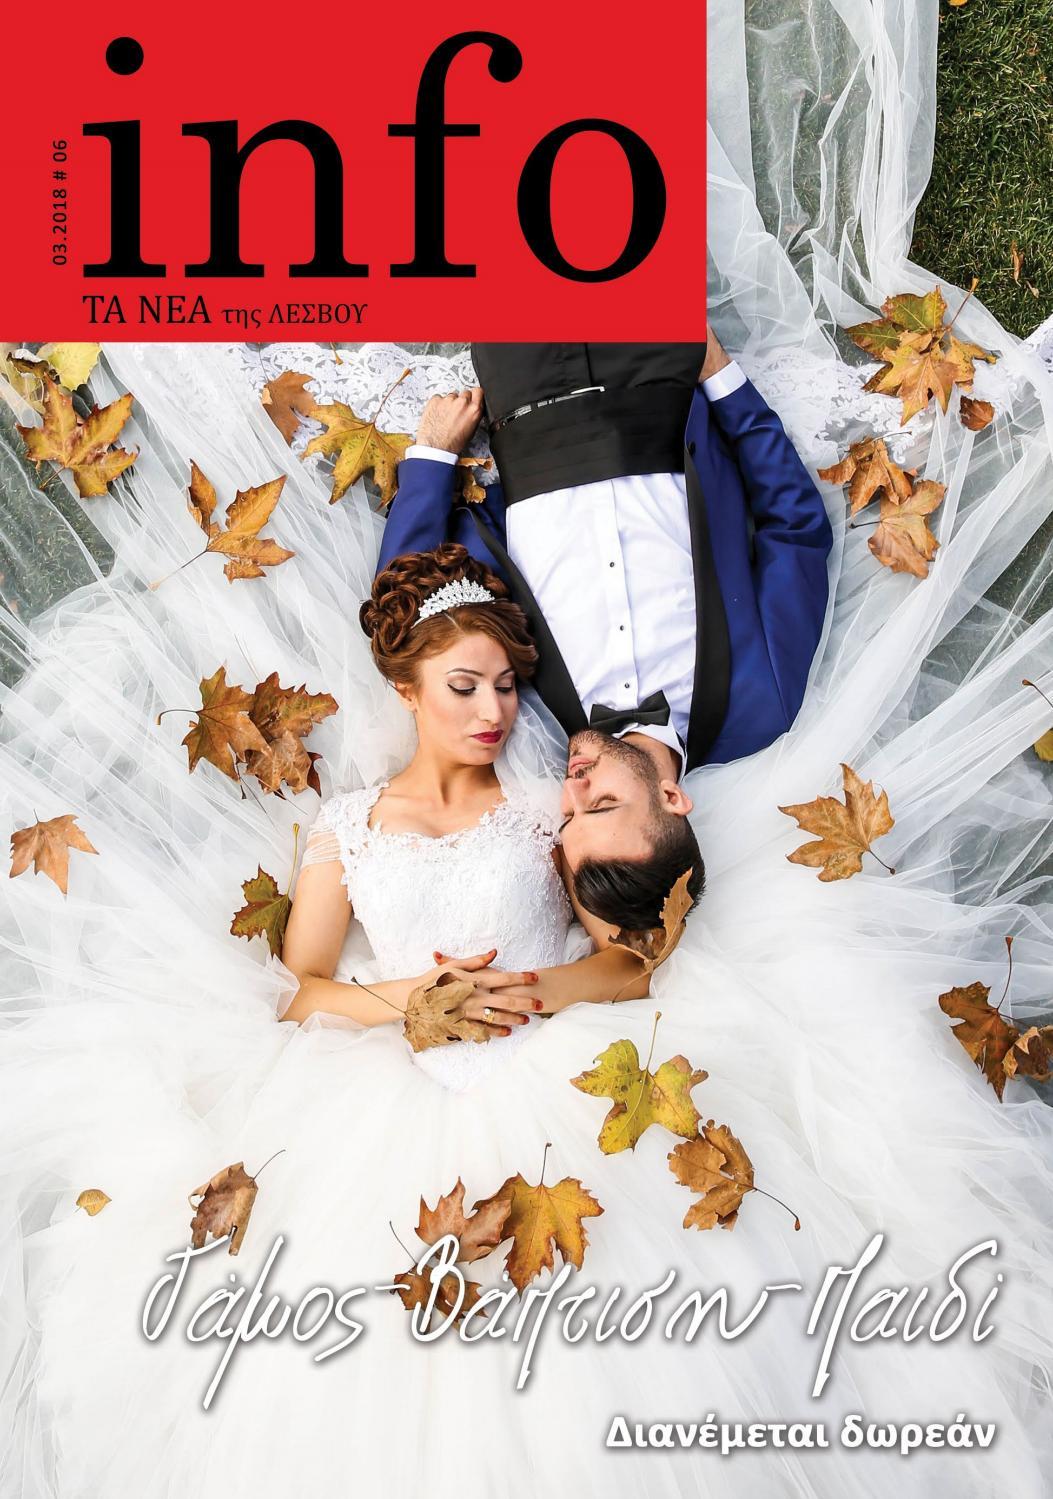 info Wedding 2018 by Τα Νέα της Λέσβου - issuu 89b063bb280